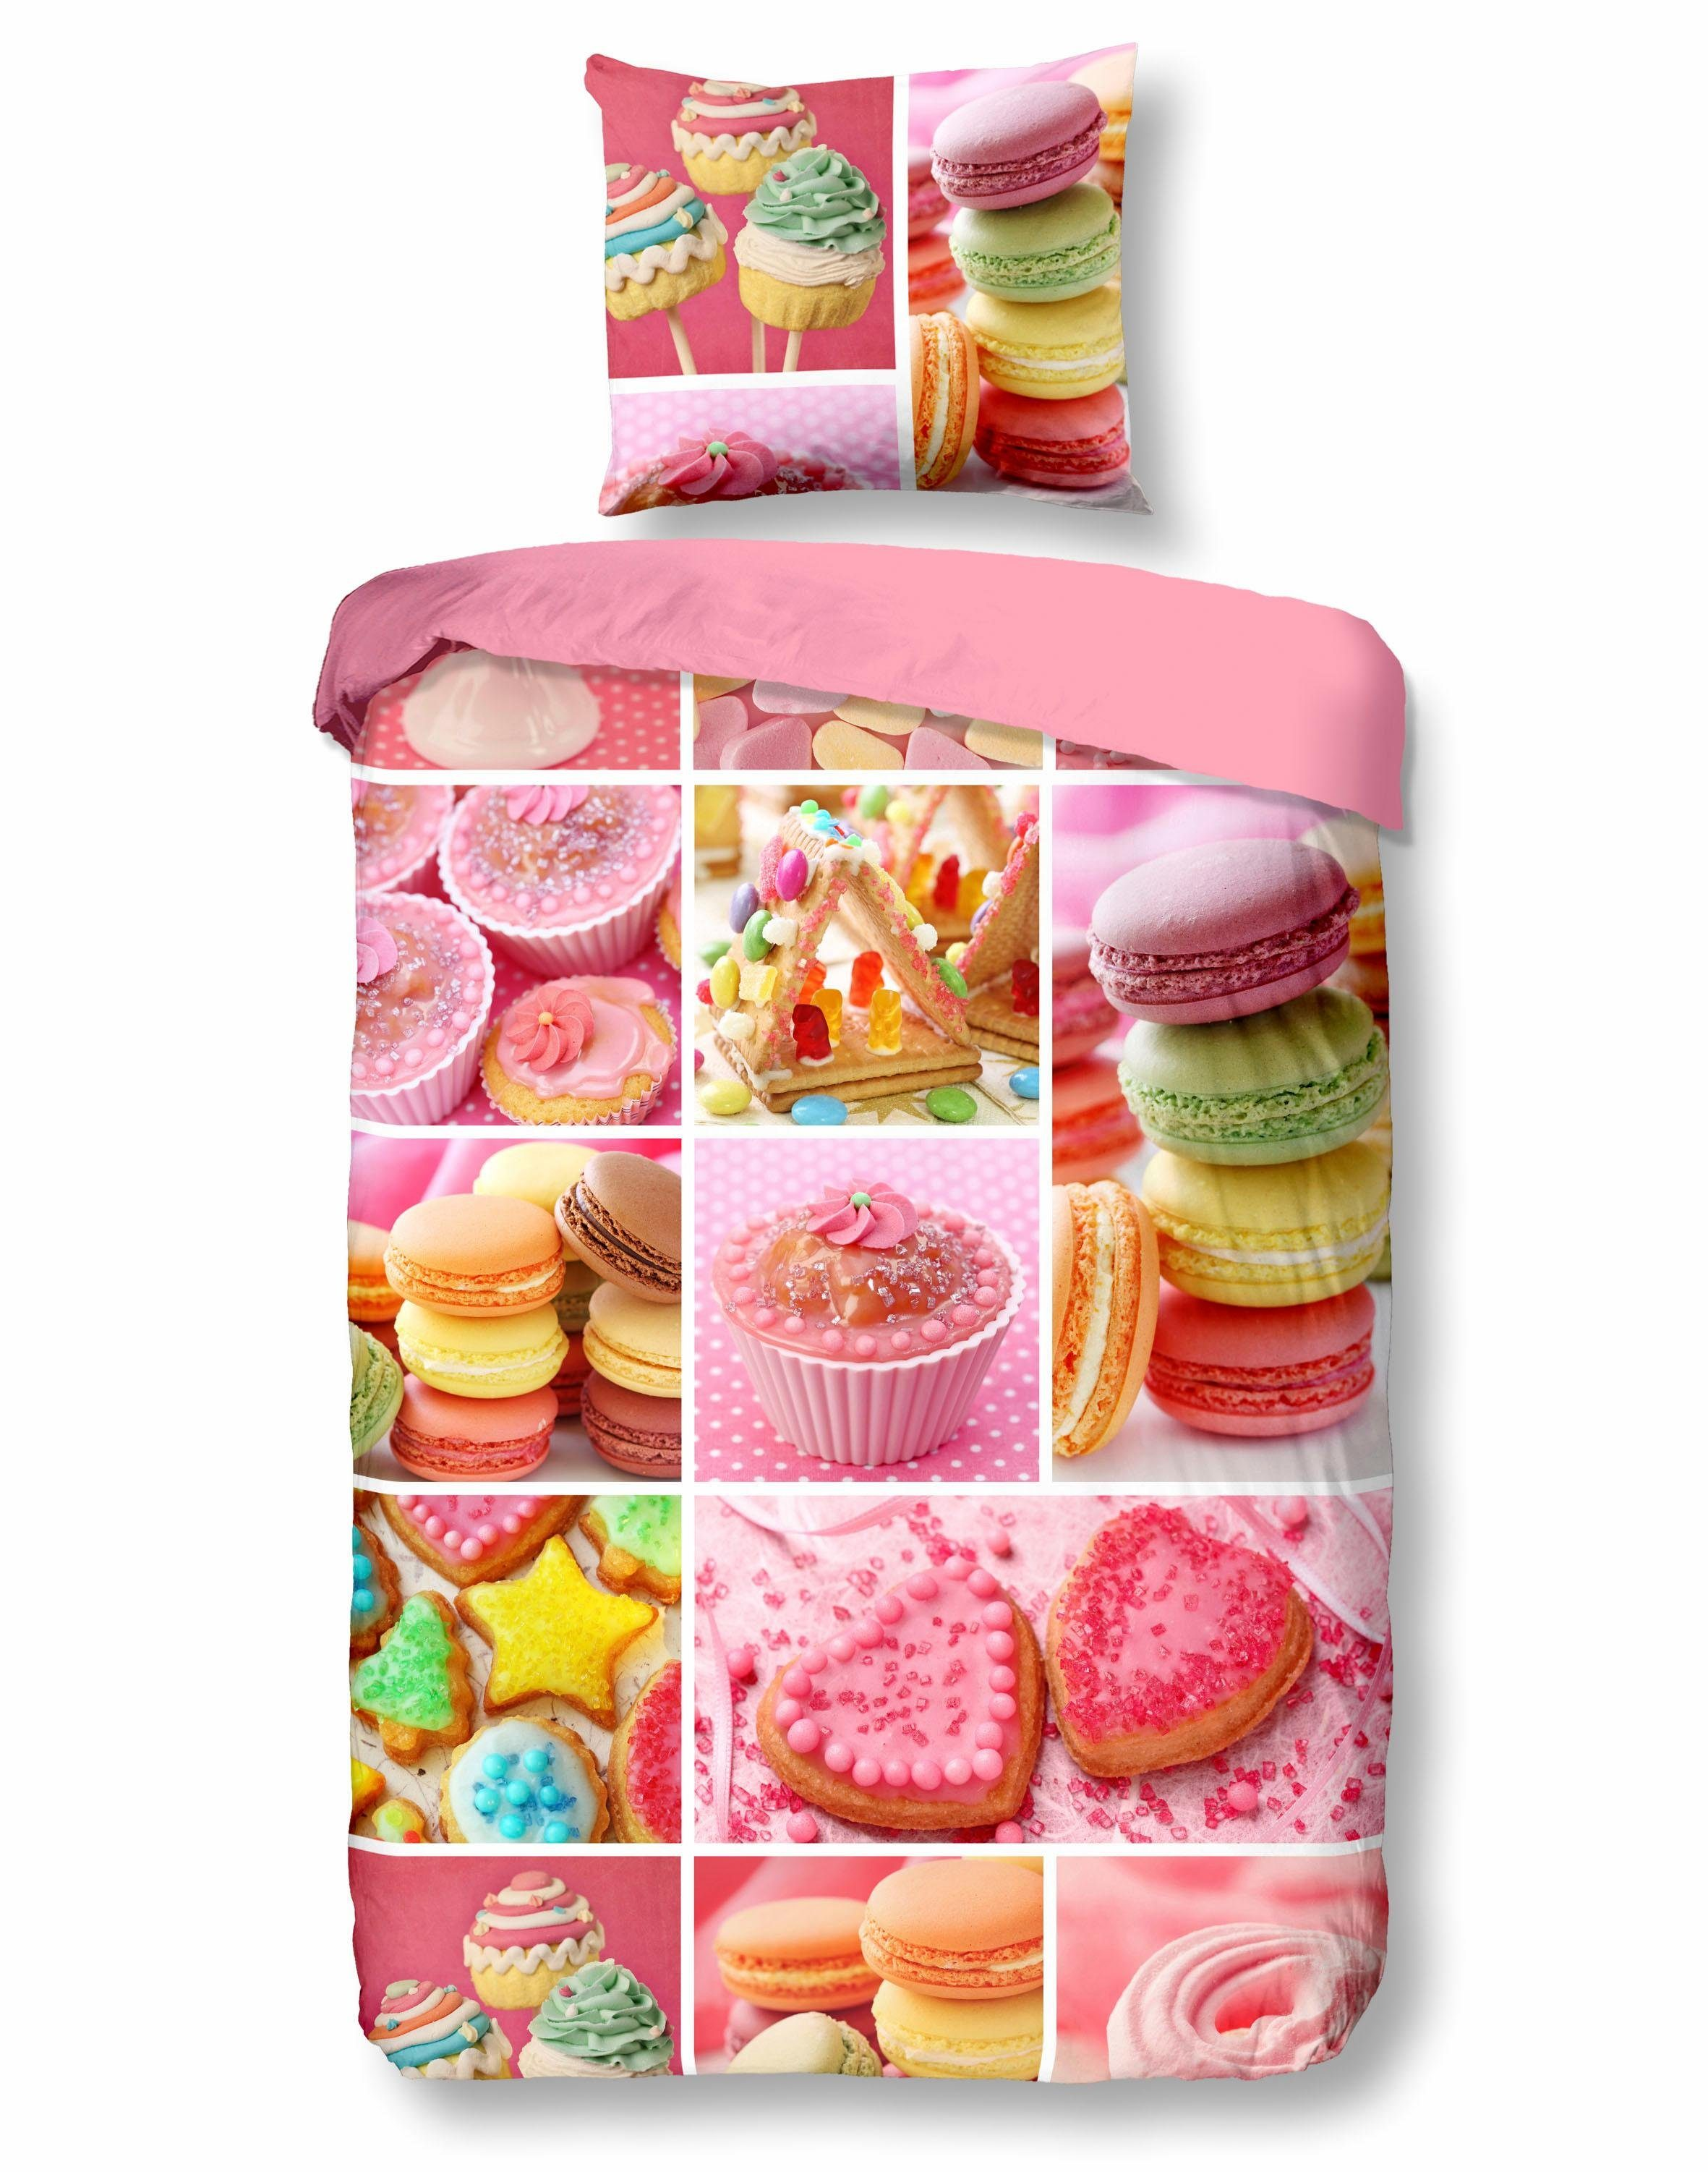 Kinderbettwäsche »Sweet«, good morning, mit süßen Motiv